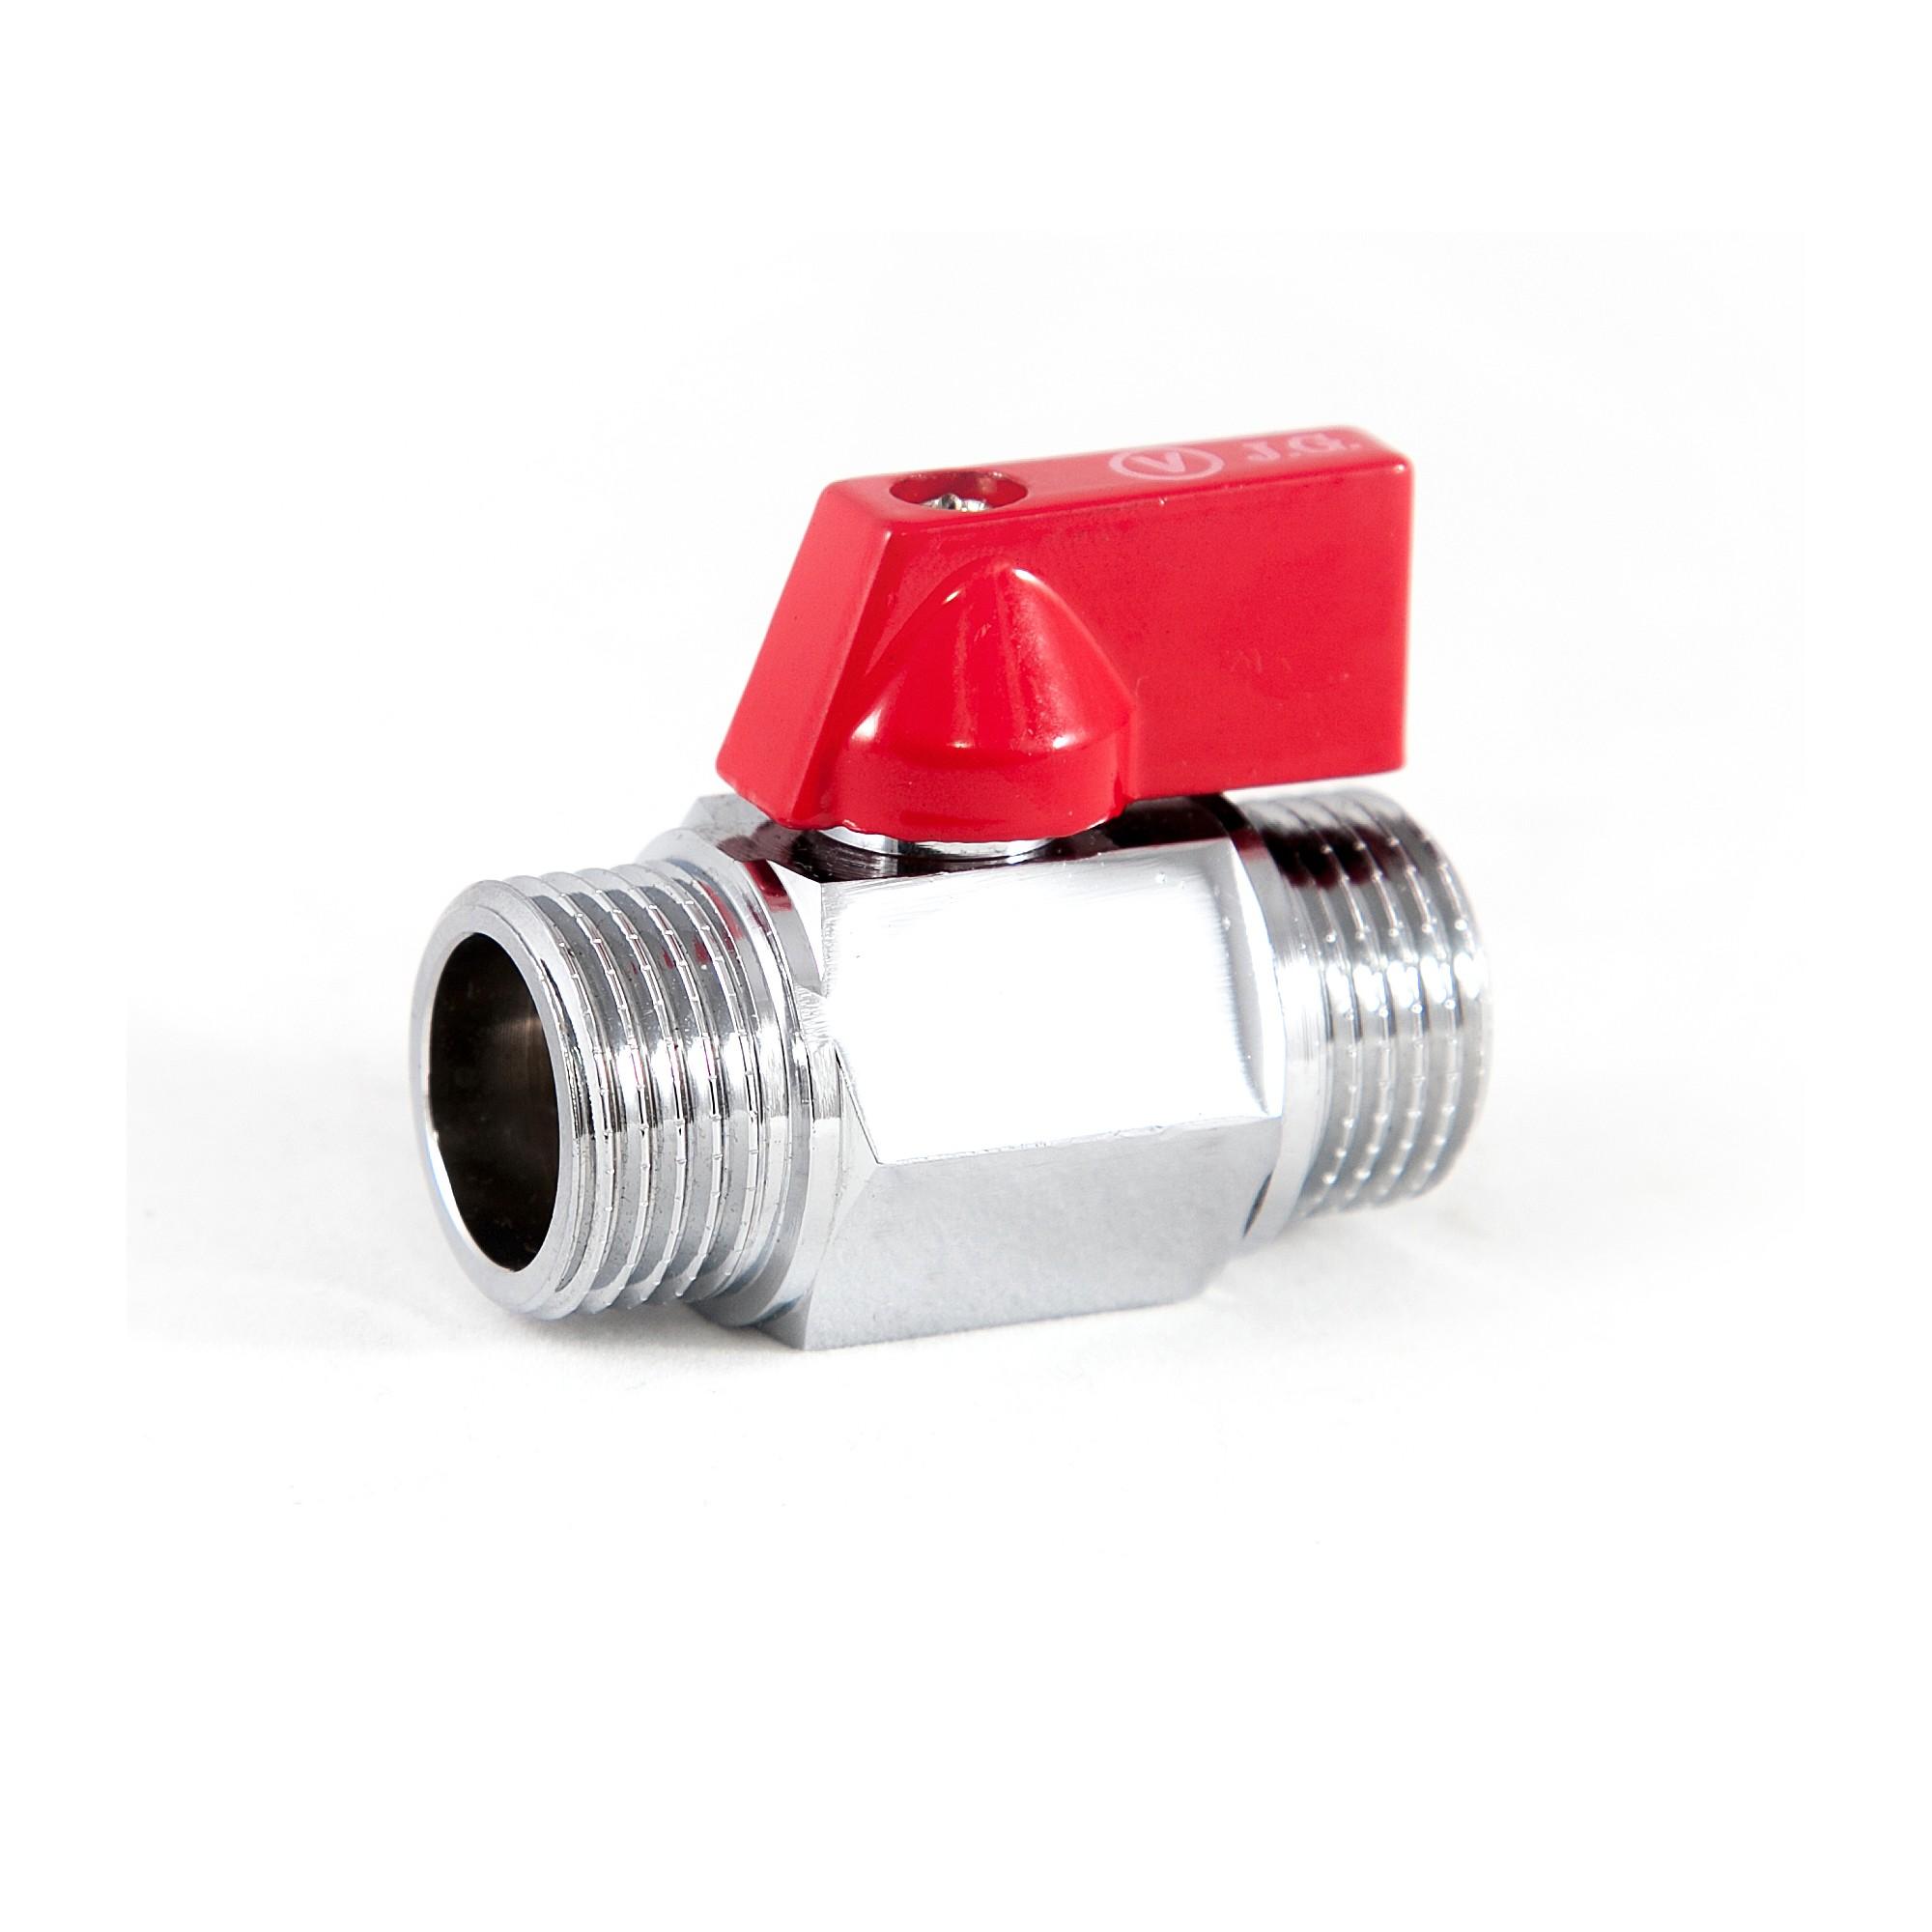 Кран шаровый MINI мини приборный 3/4'' нн Valve J.G. J.G. - 1